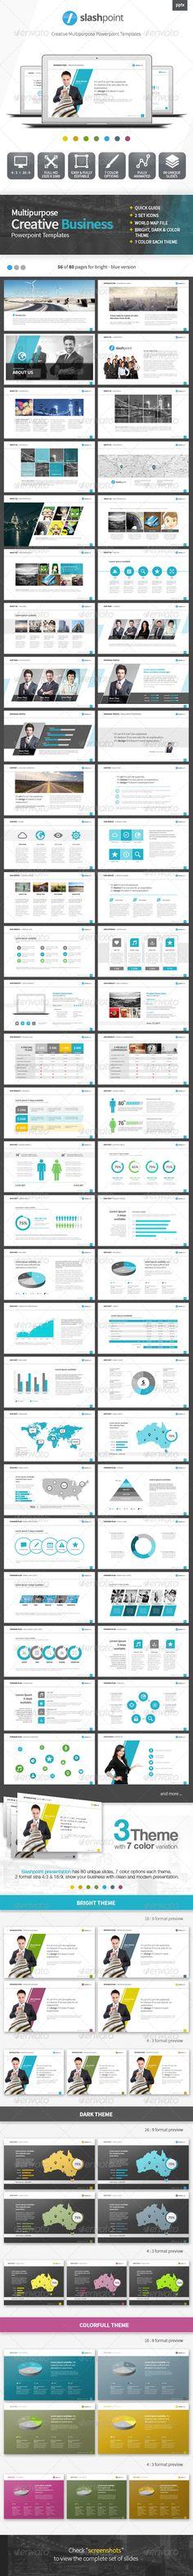 Slashpoint   Creative Business powerpoint template (Powerpoint Templates) #Powerpoint #Powerpoint_Template #Presentation